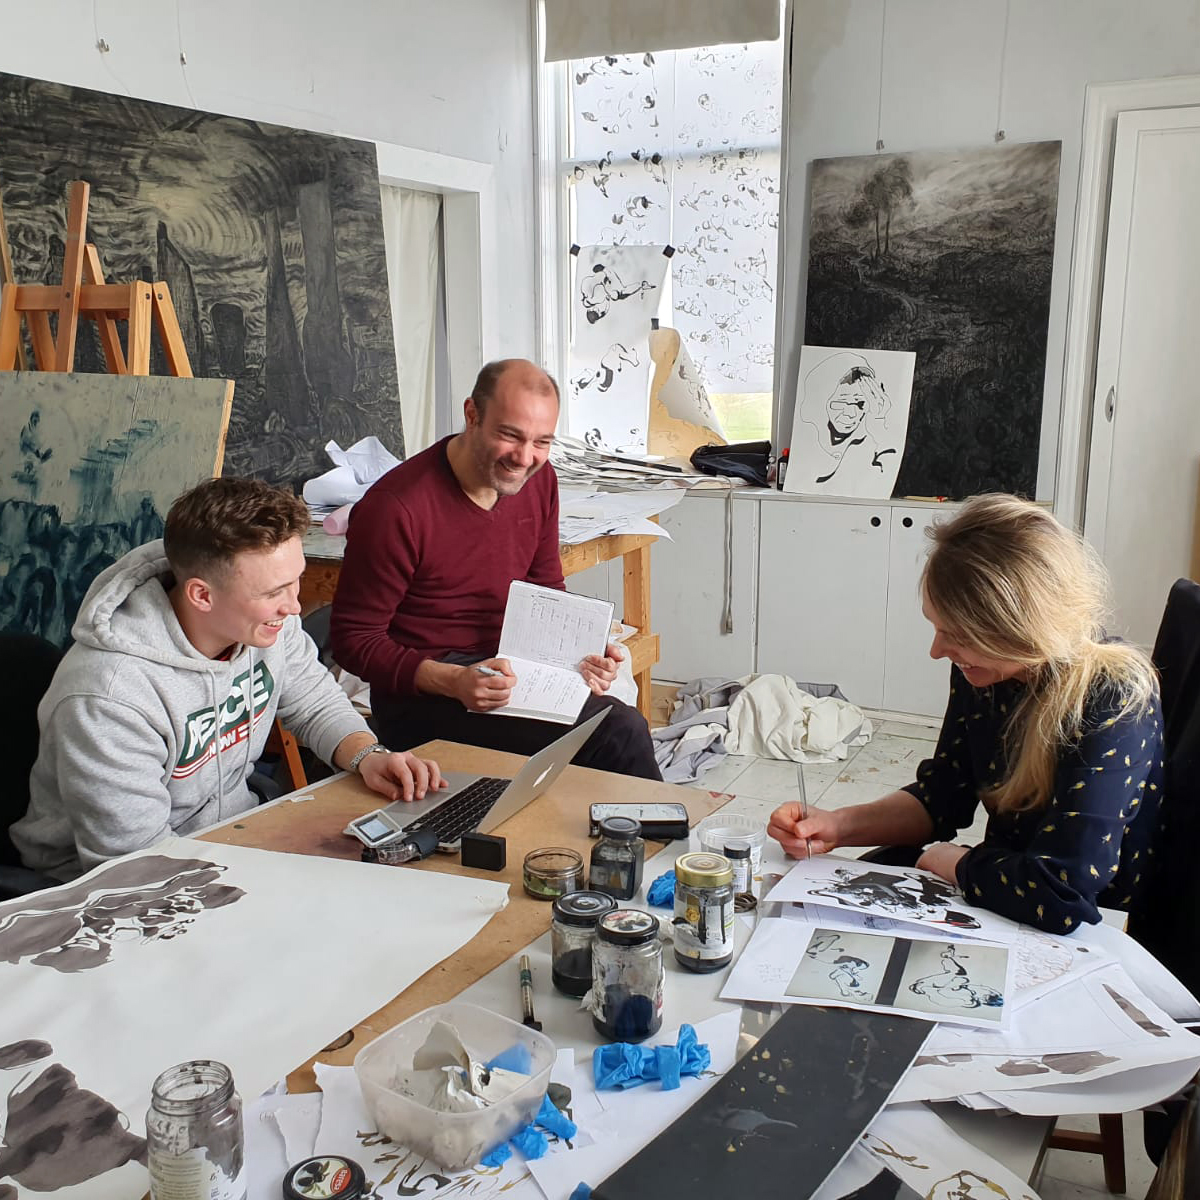 Kate Steenhauer, Andrew Starkey & Jack Caven